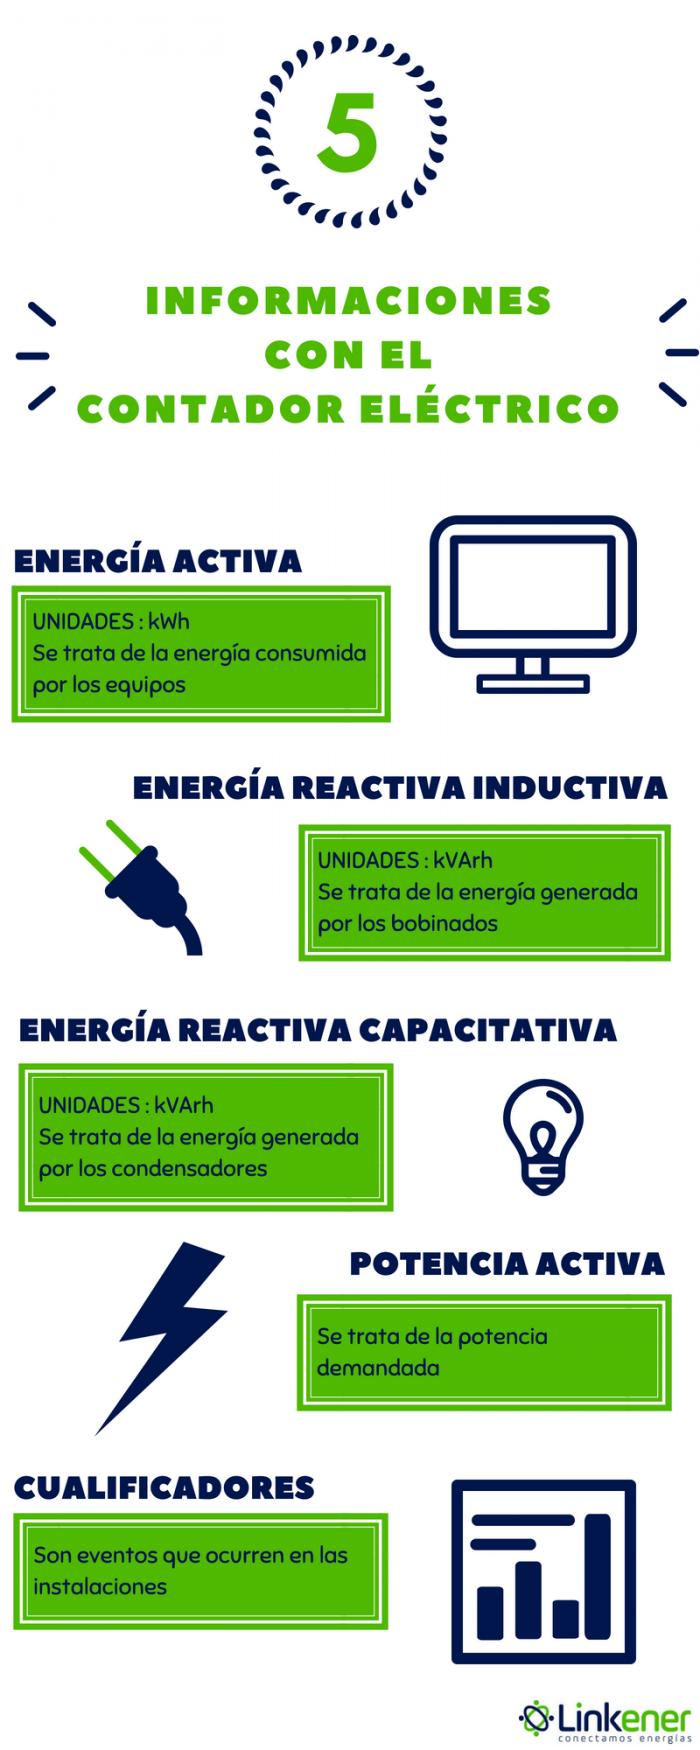 Contador eléctrico. Linkener. Eficiencia energética